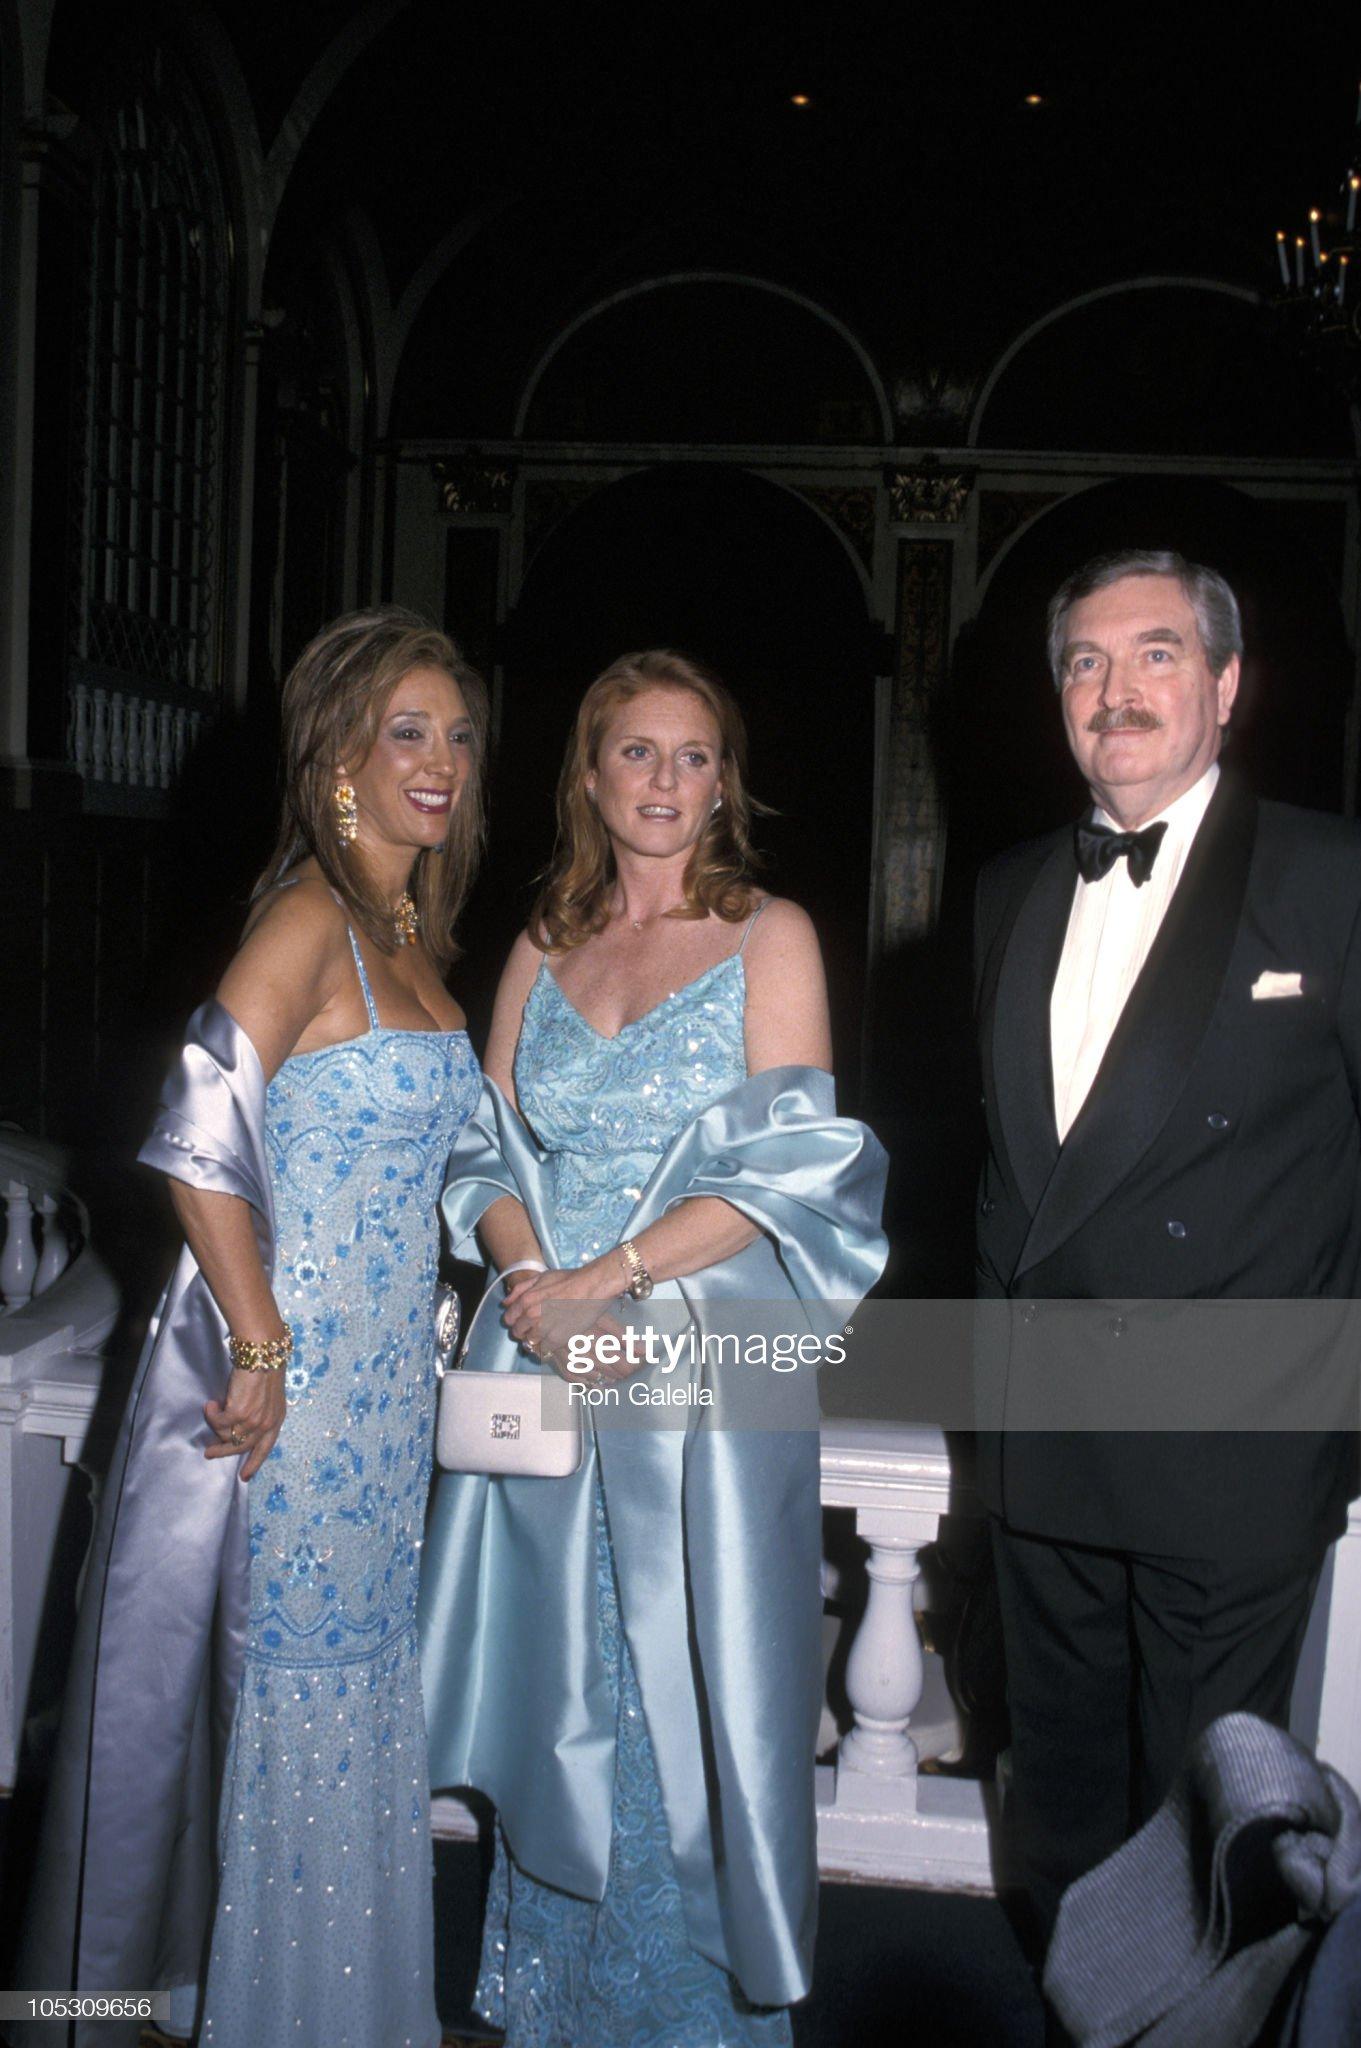 Вечерние наряды Отем пока еще Филлипс и Сары Йоркской 2nd Annual Walpole Committee Gala : News Photo